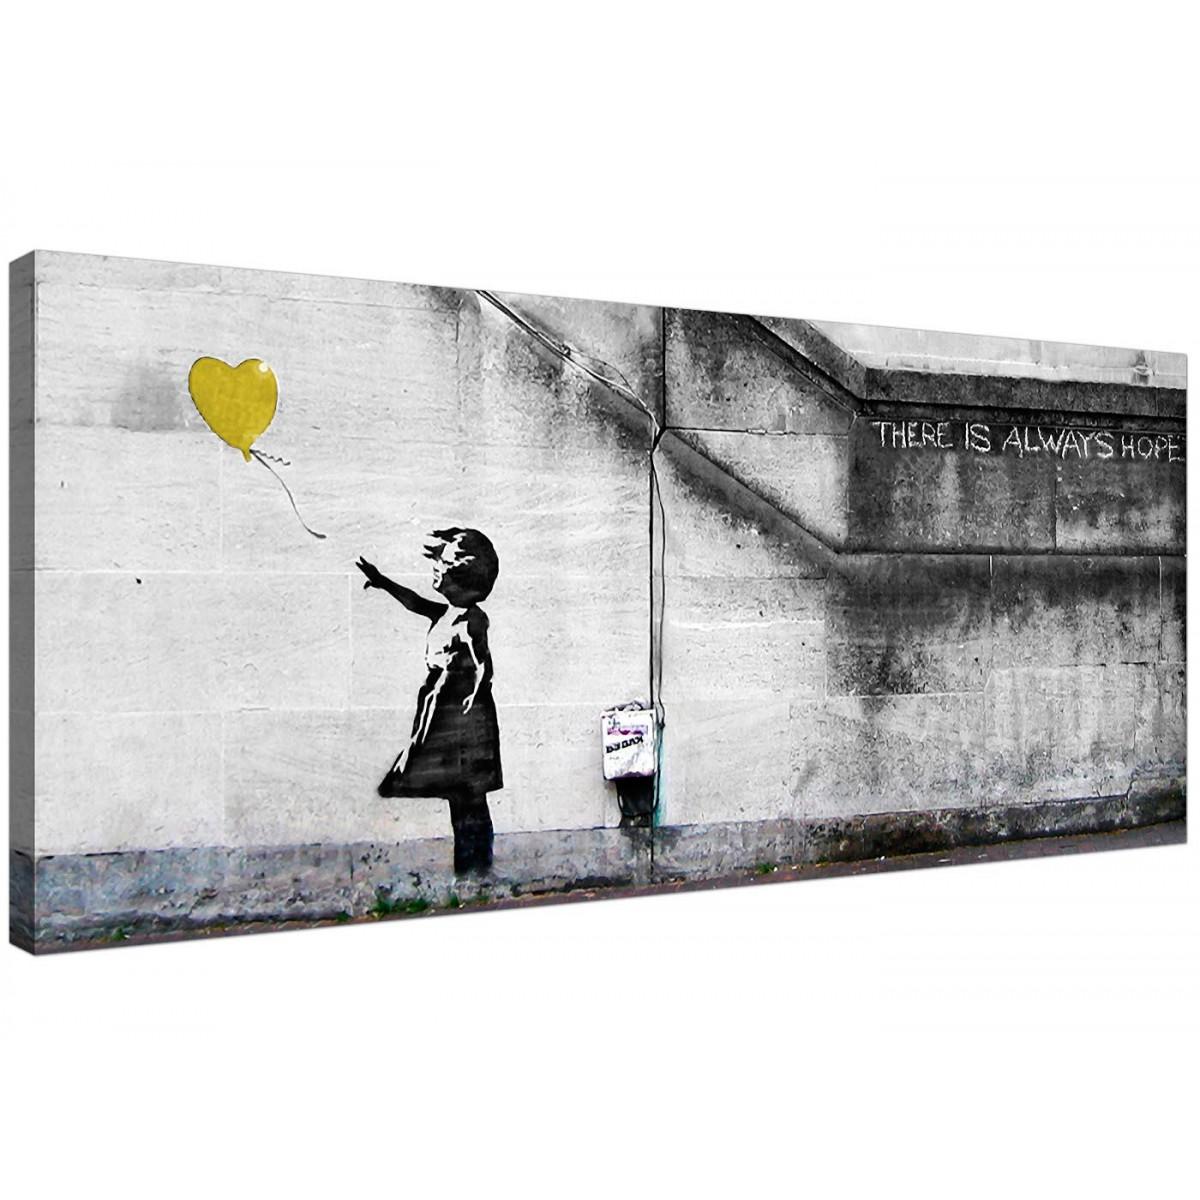 Cheap Yellow Canvas Art Of Banksy Balloon Girl